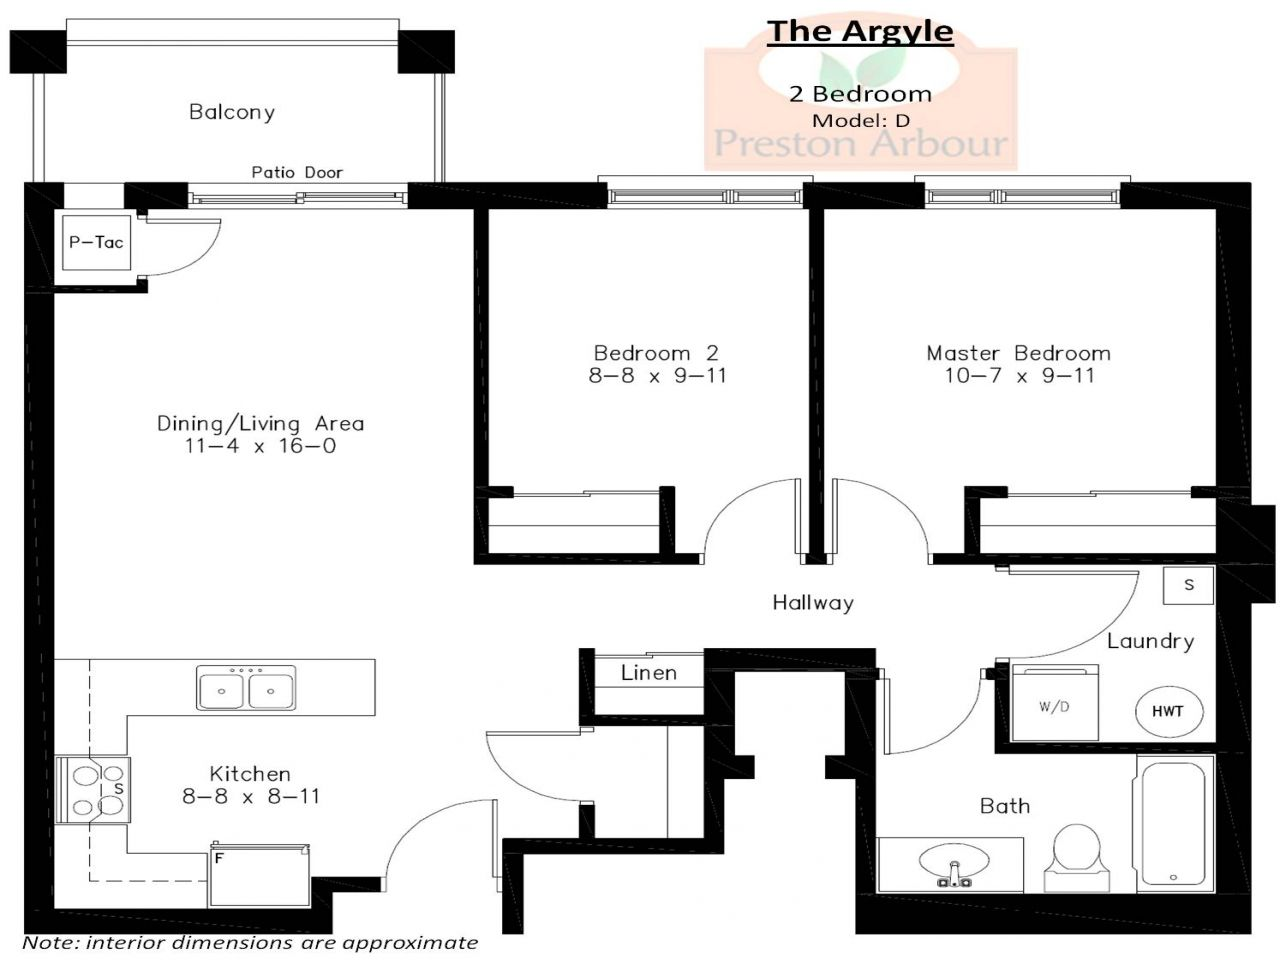 bddbefedb cad architecture home design floor plan software autocad ...